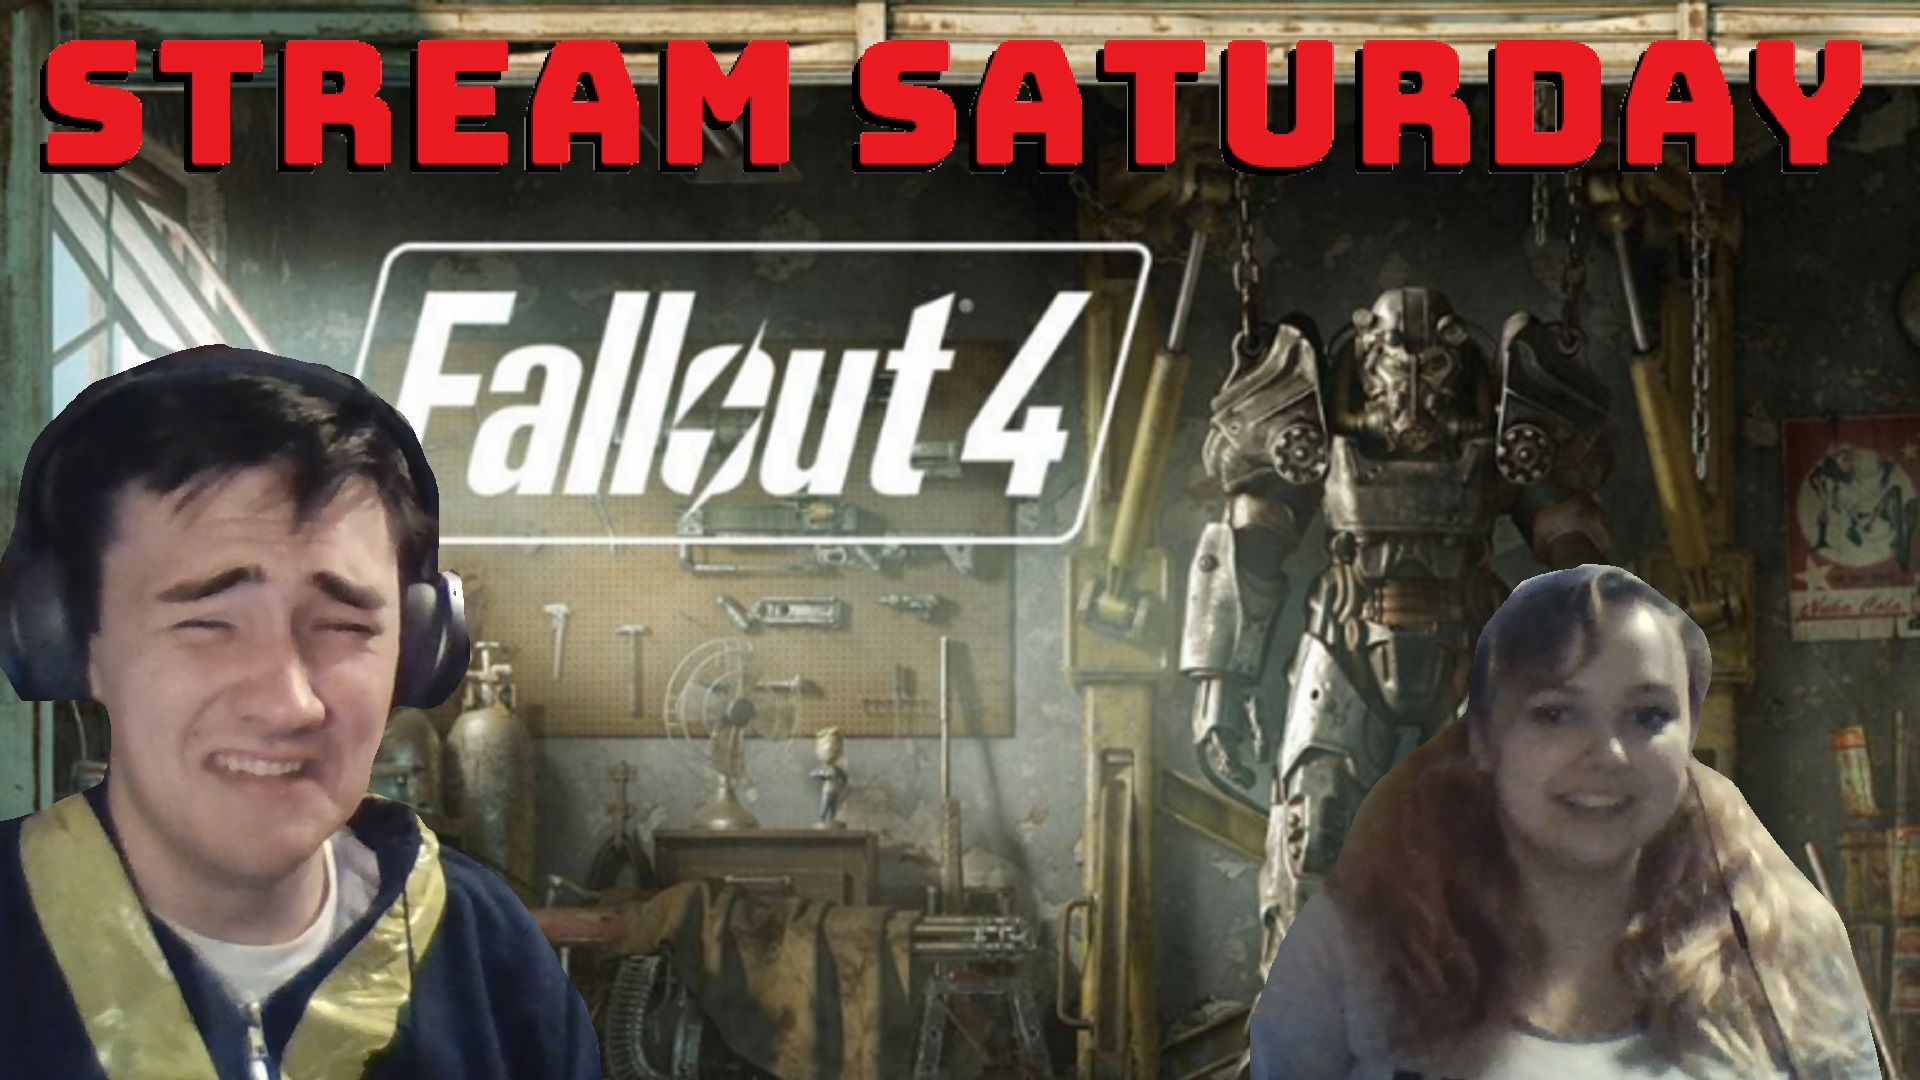 Fallout 4 Thumb Final.jpg